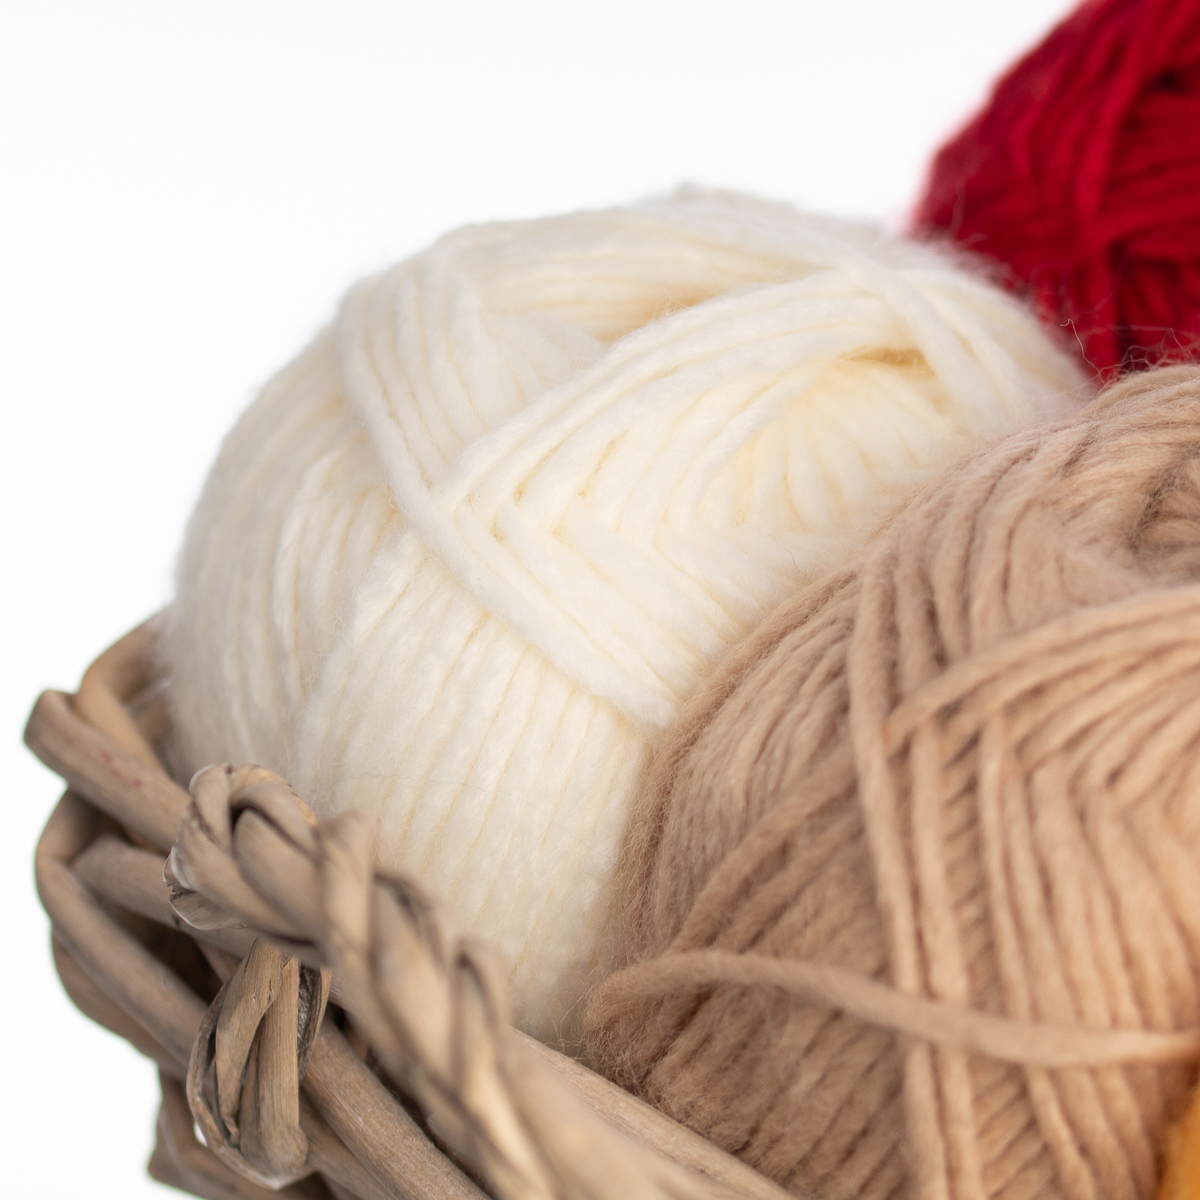 3pk-Lion-Brand-New-Basic-Acrylic-amp-Wool-Yarn-Medium-4-Knit-Crochet-Skeins-Soft thumbnail 34